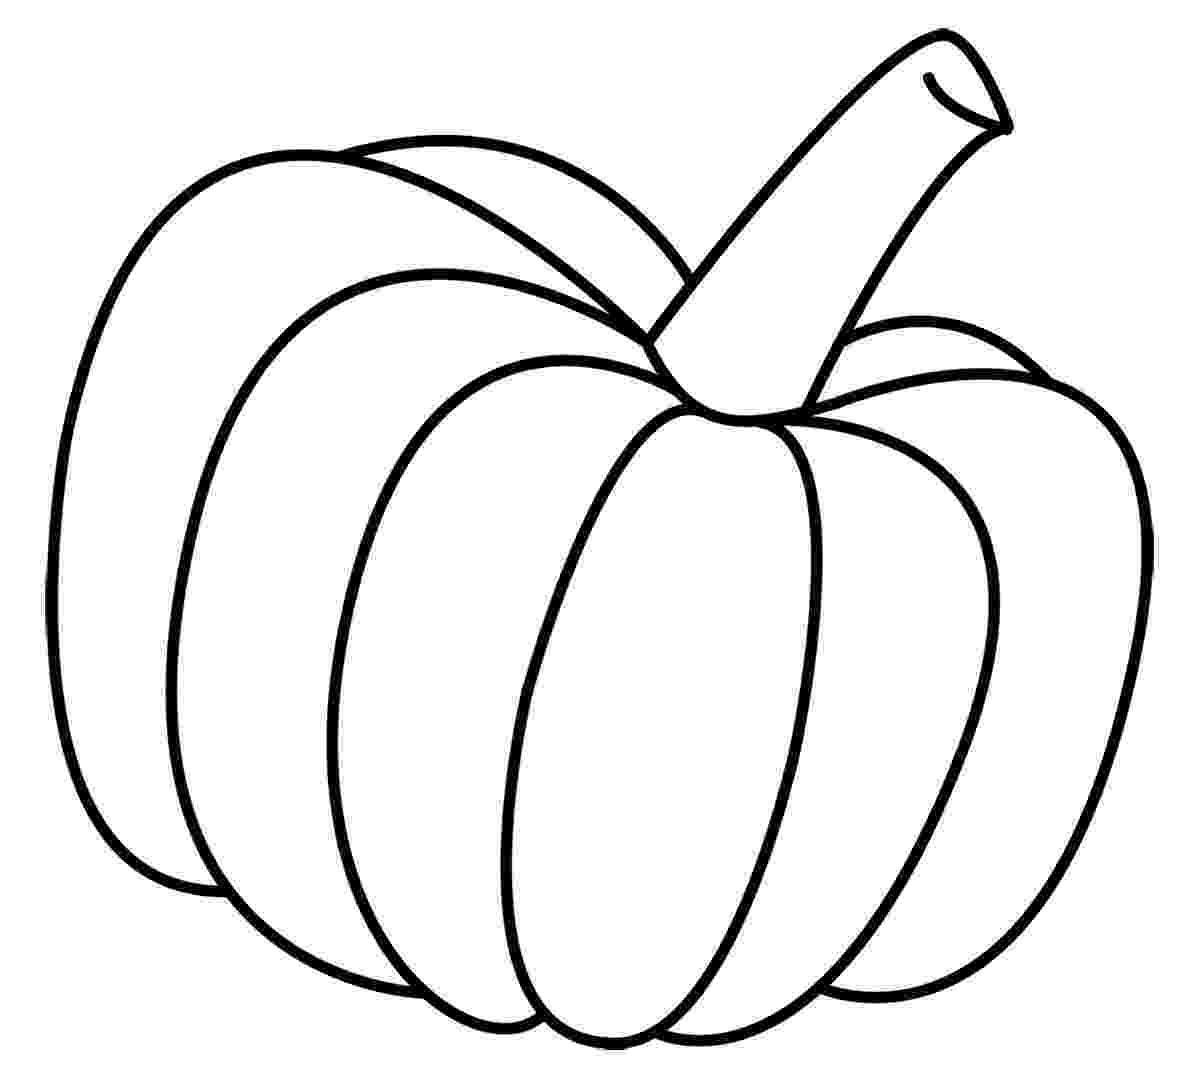 pumpkin coloring page free printable pumpkin coloring pages for kids cool2bkids coloring page pumpkin